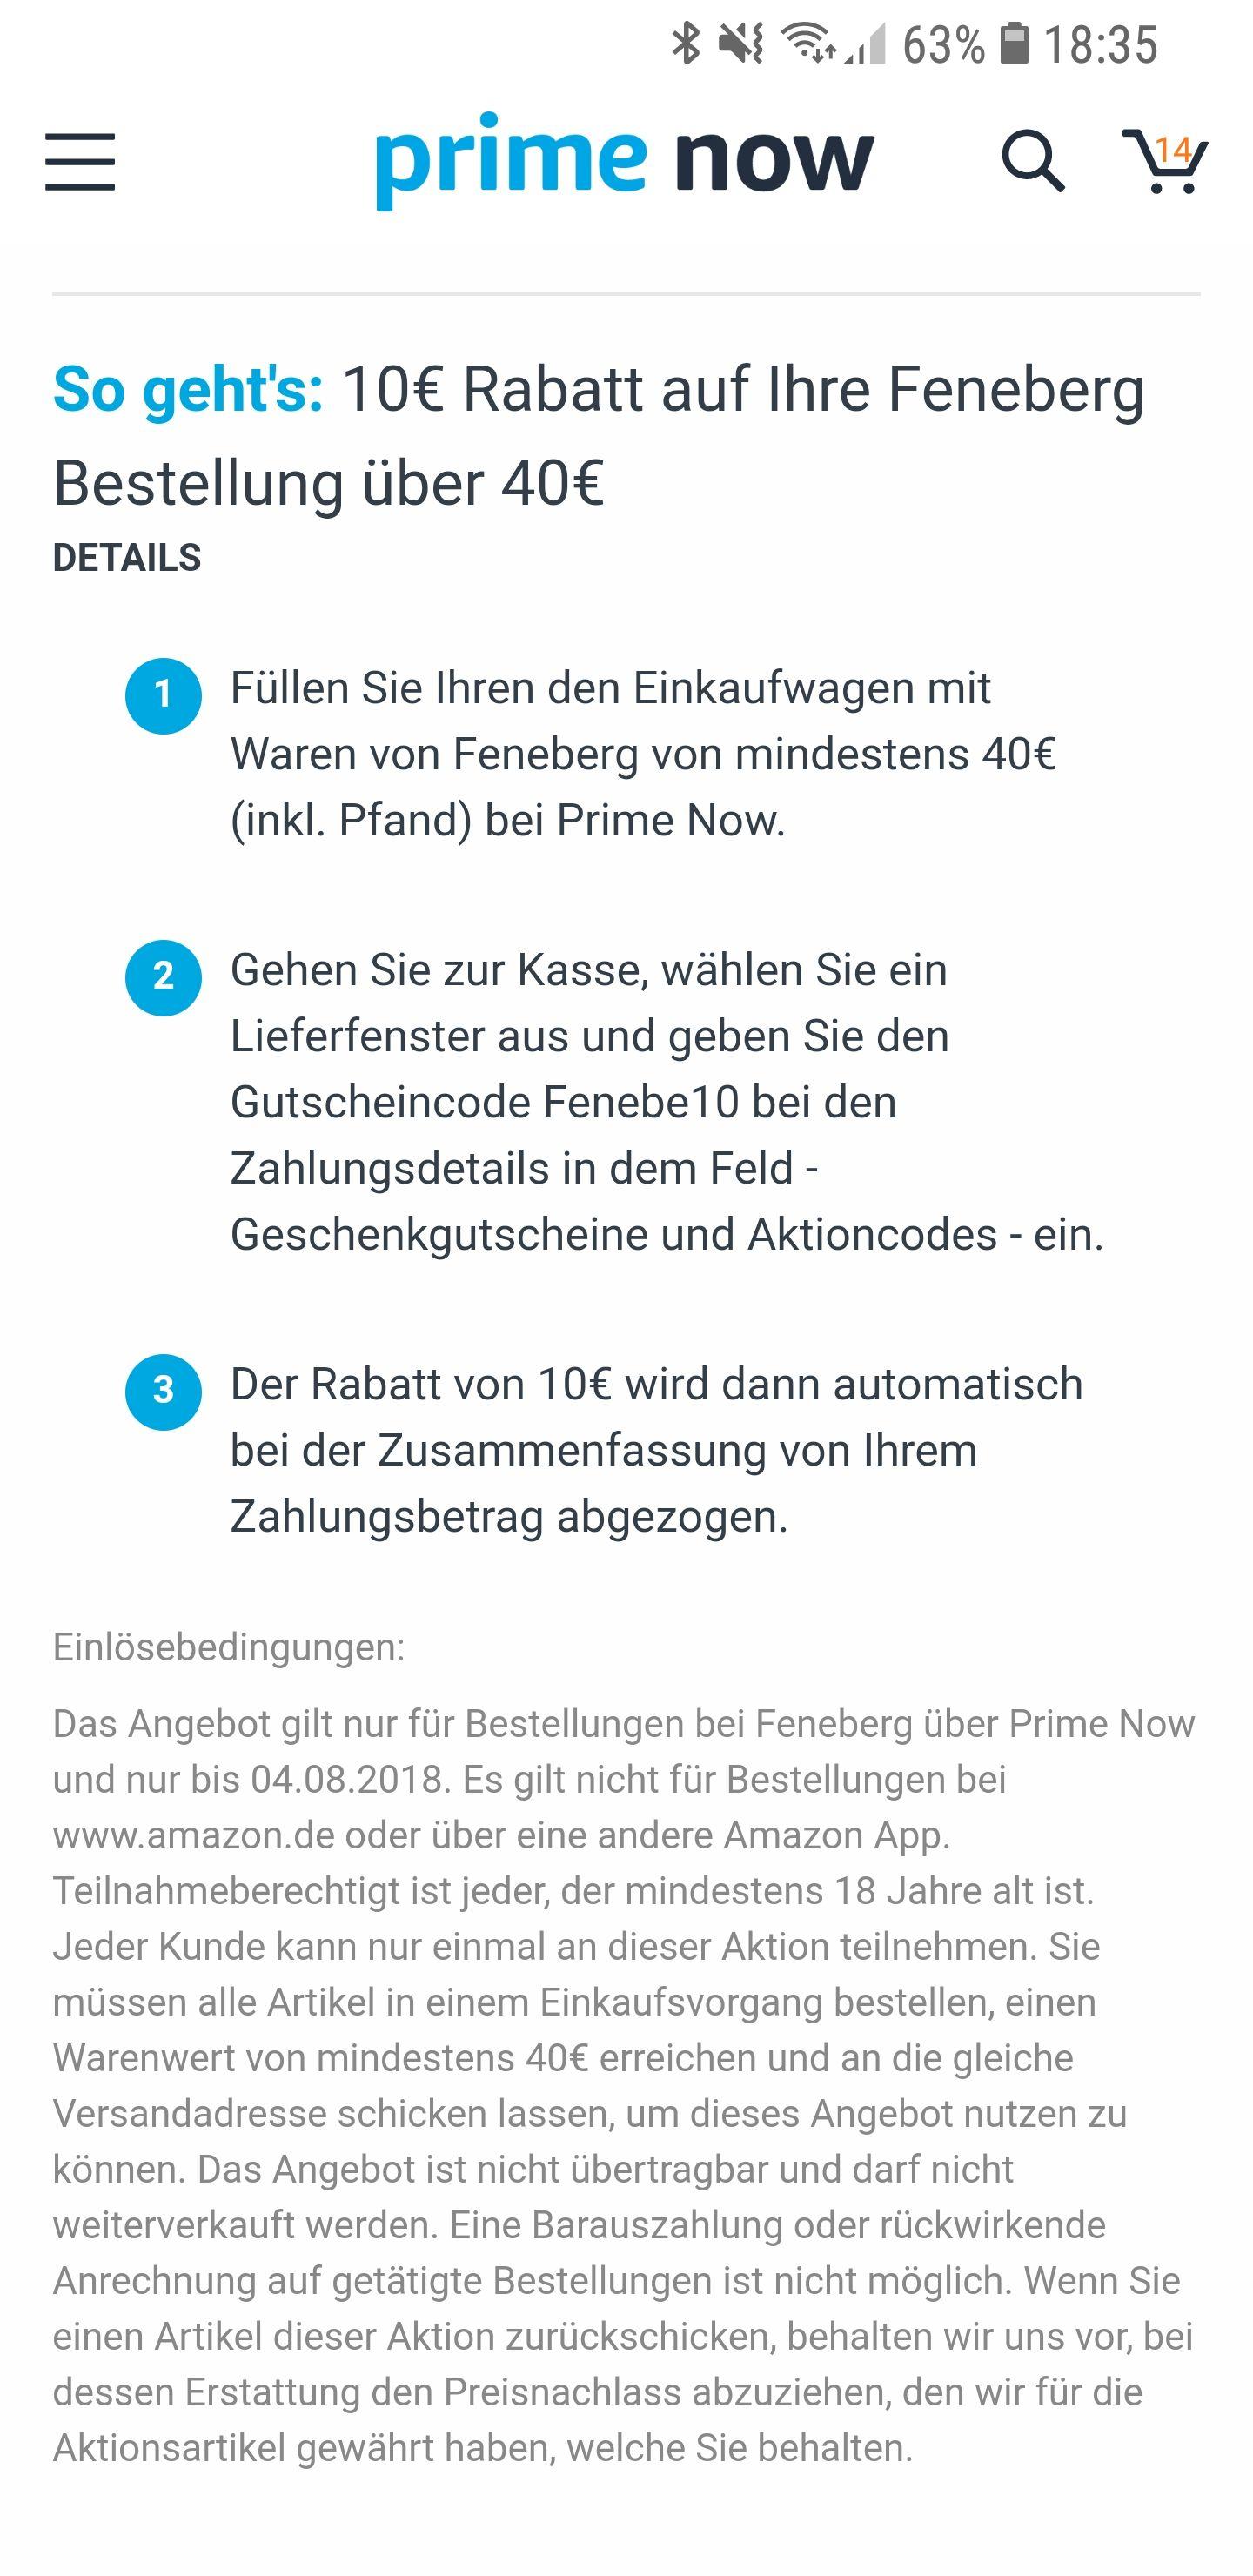 Amazon Prime Now [Muc/Berlin]: Feneberg 10€ Rabatt bei 40€ MBW